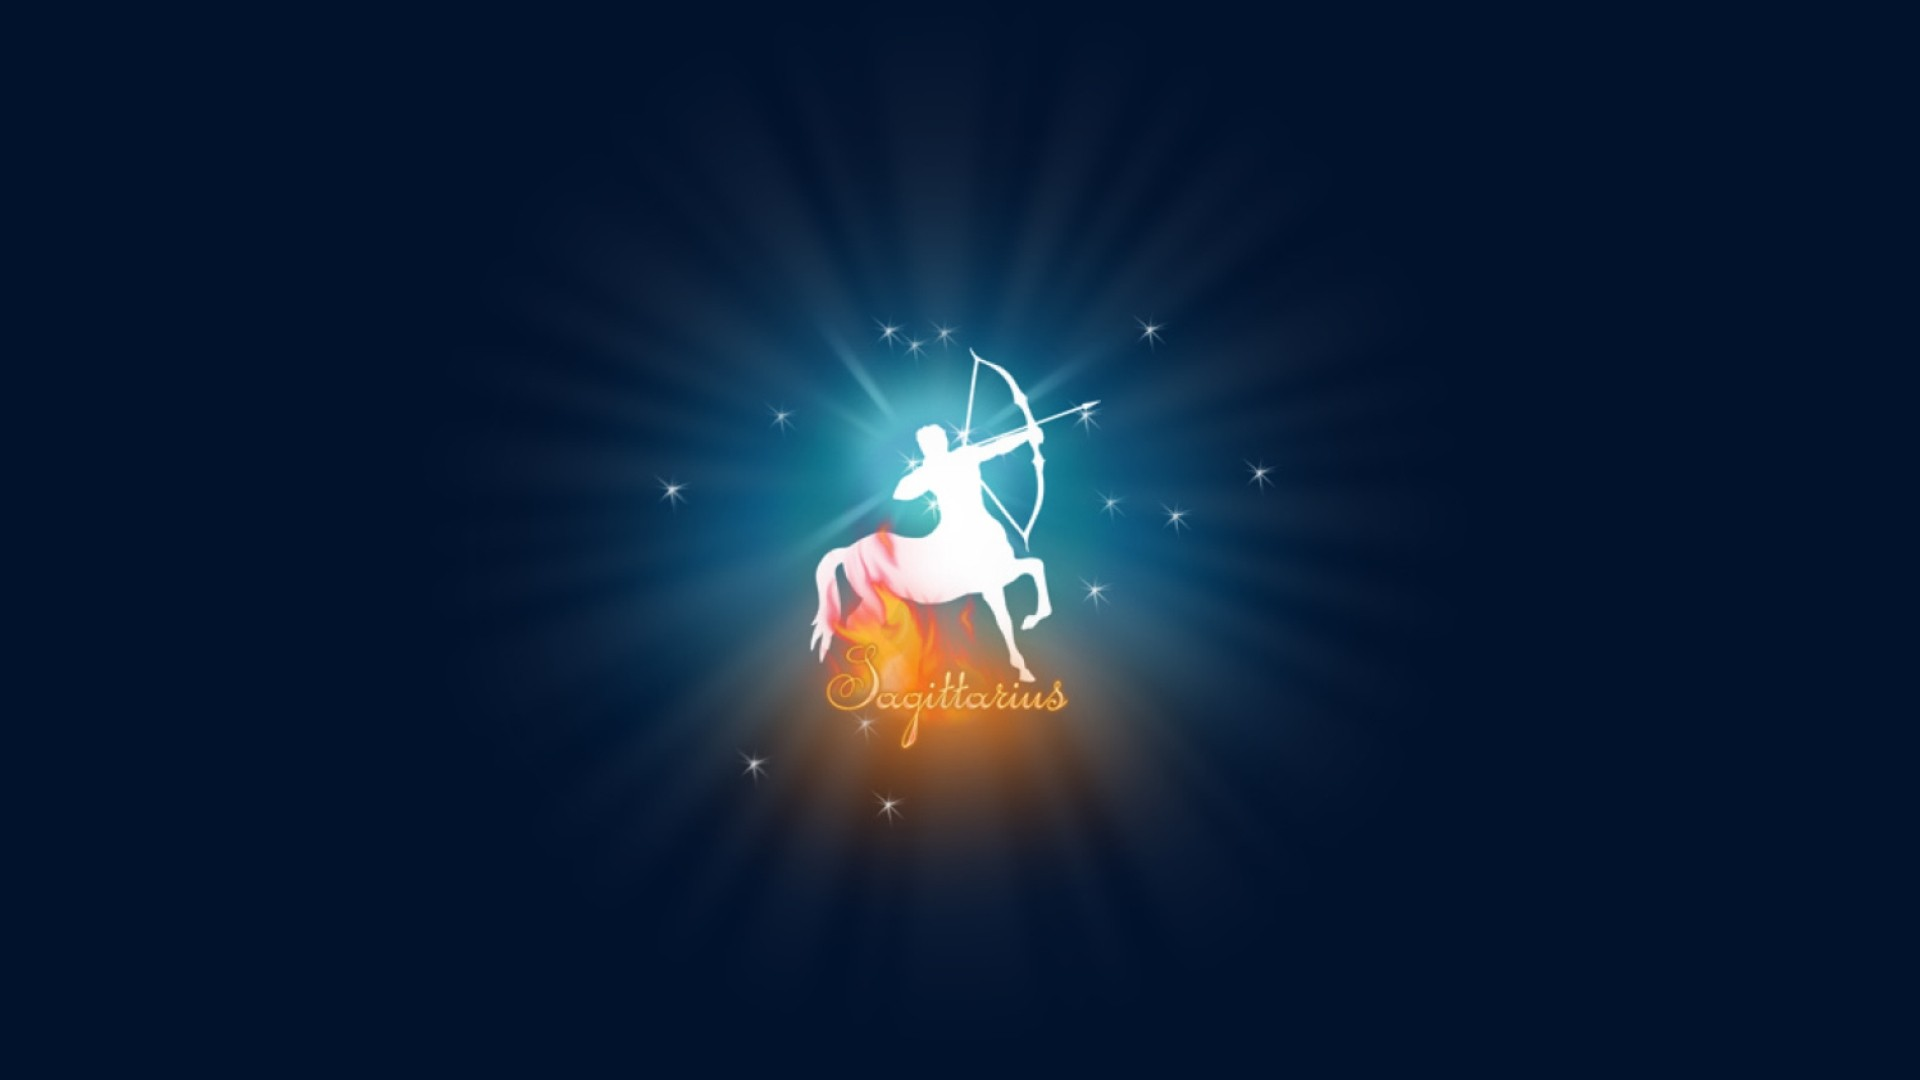 Sagittarius HD Download